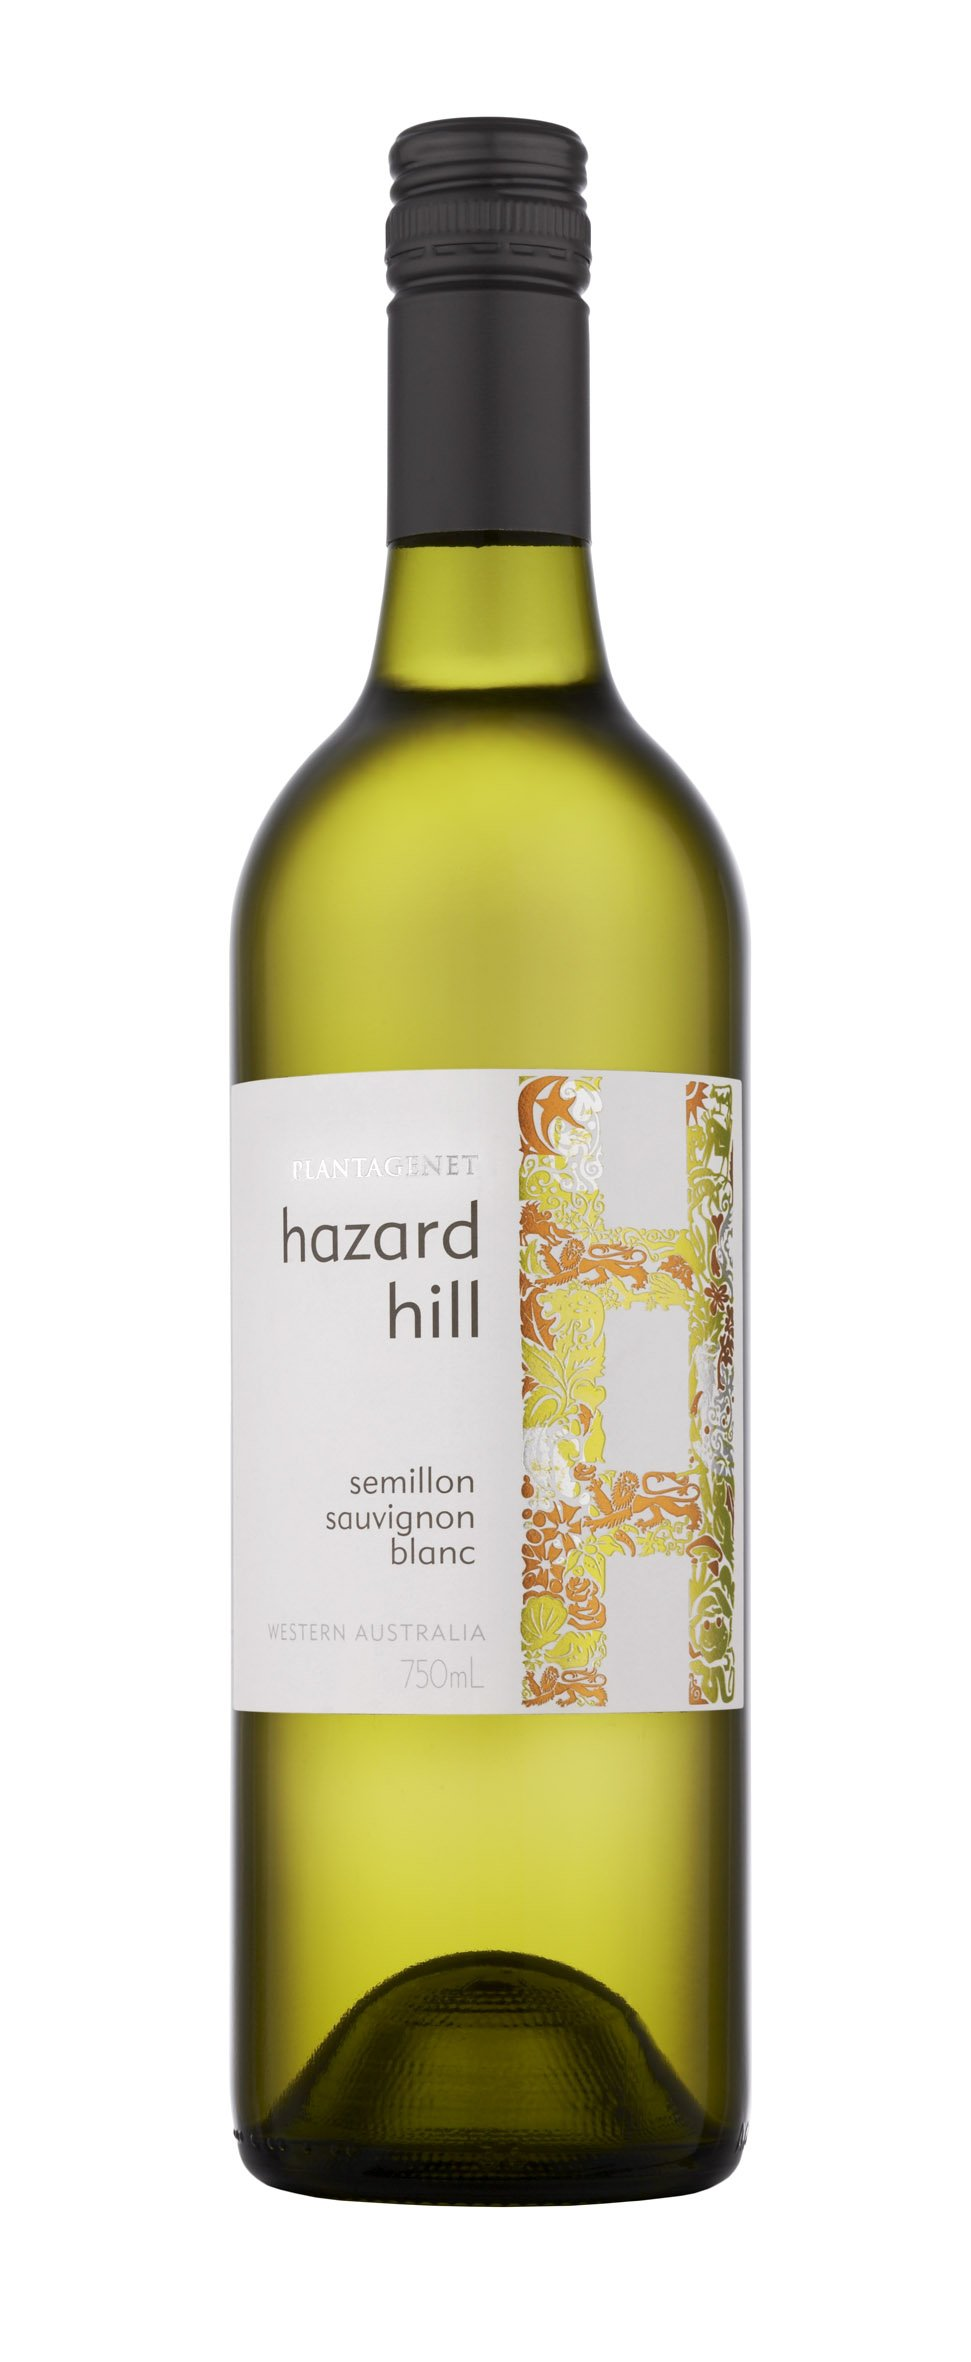 2010 Plantagenet Hazard Hill Sauvignon Blanc Semillon Western Australia